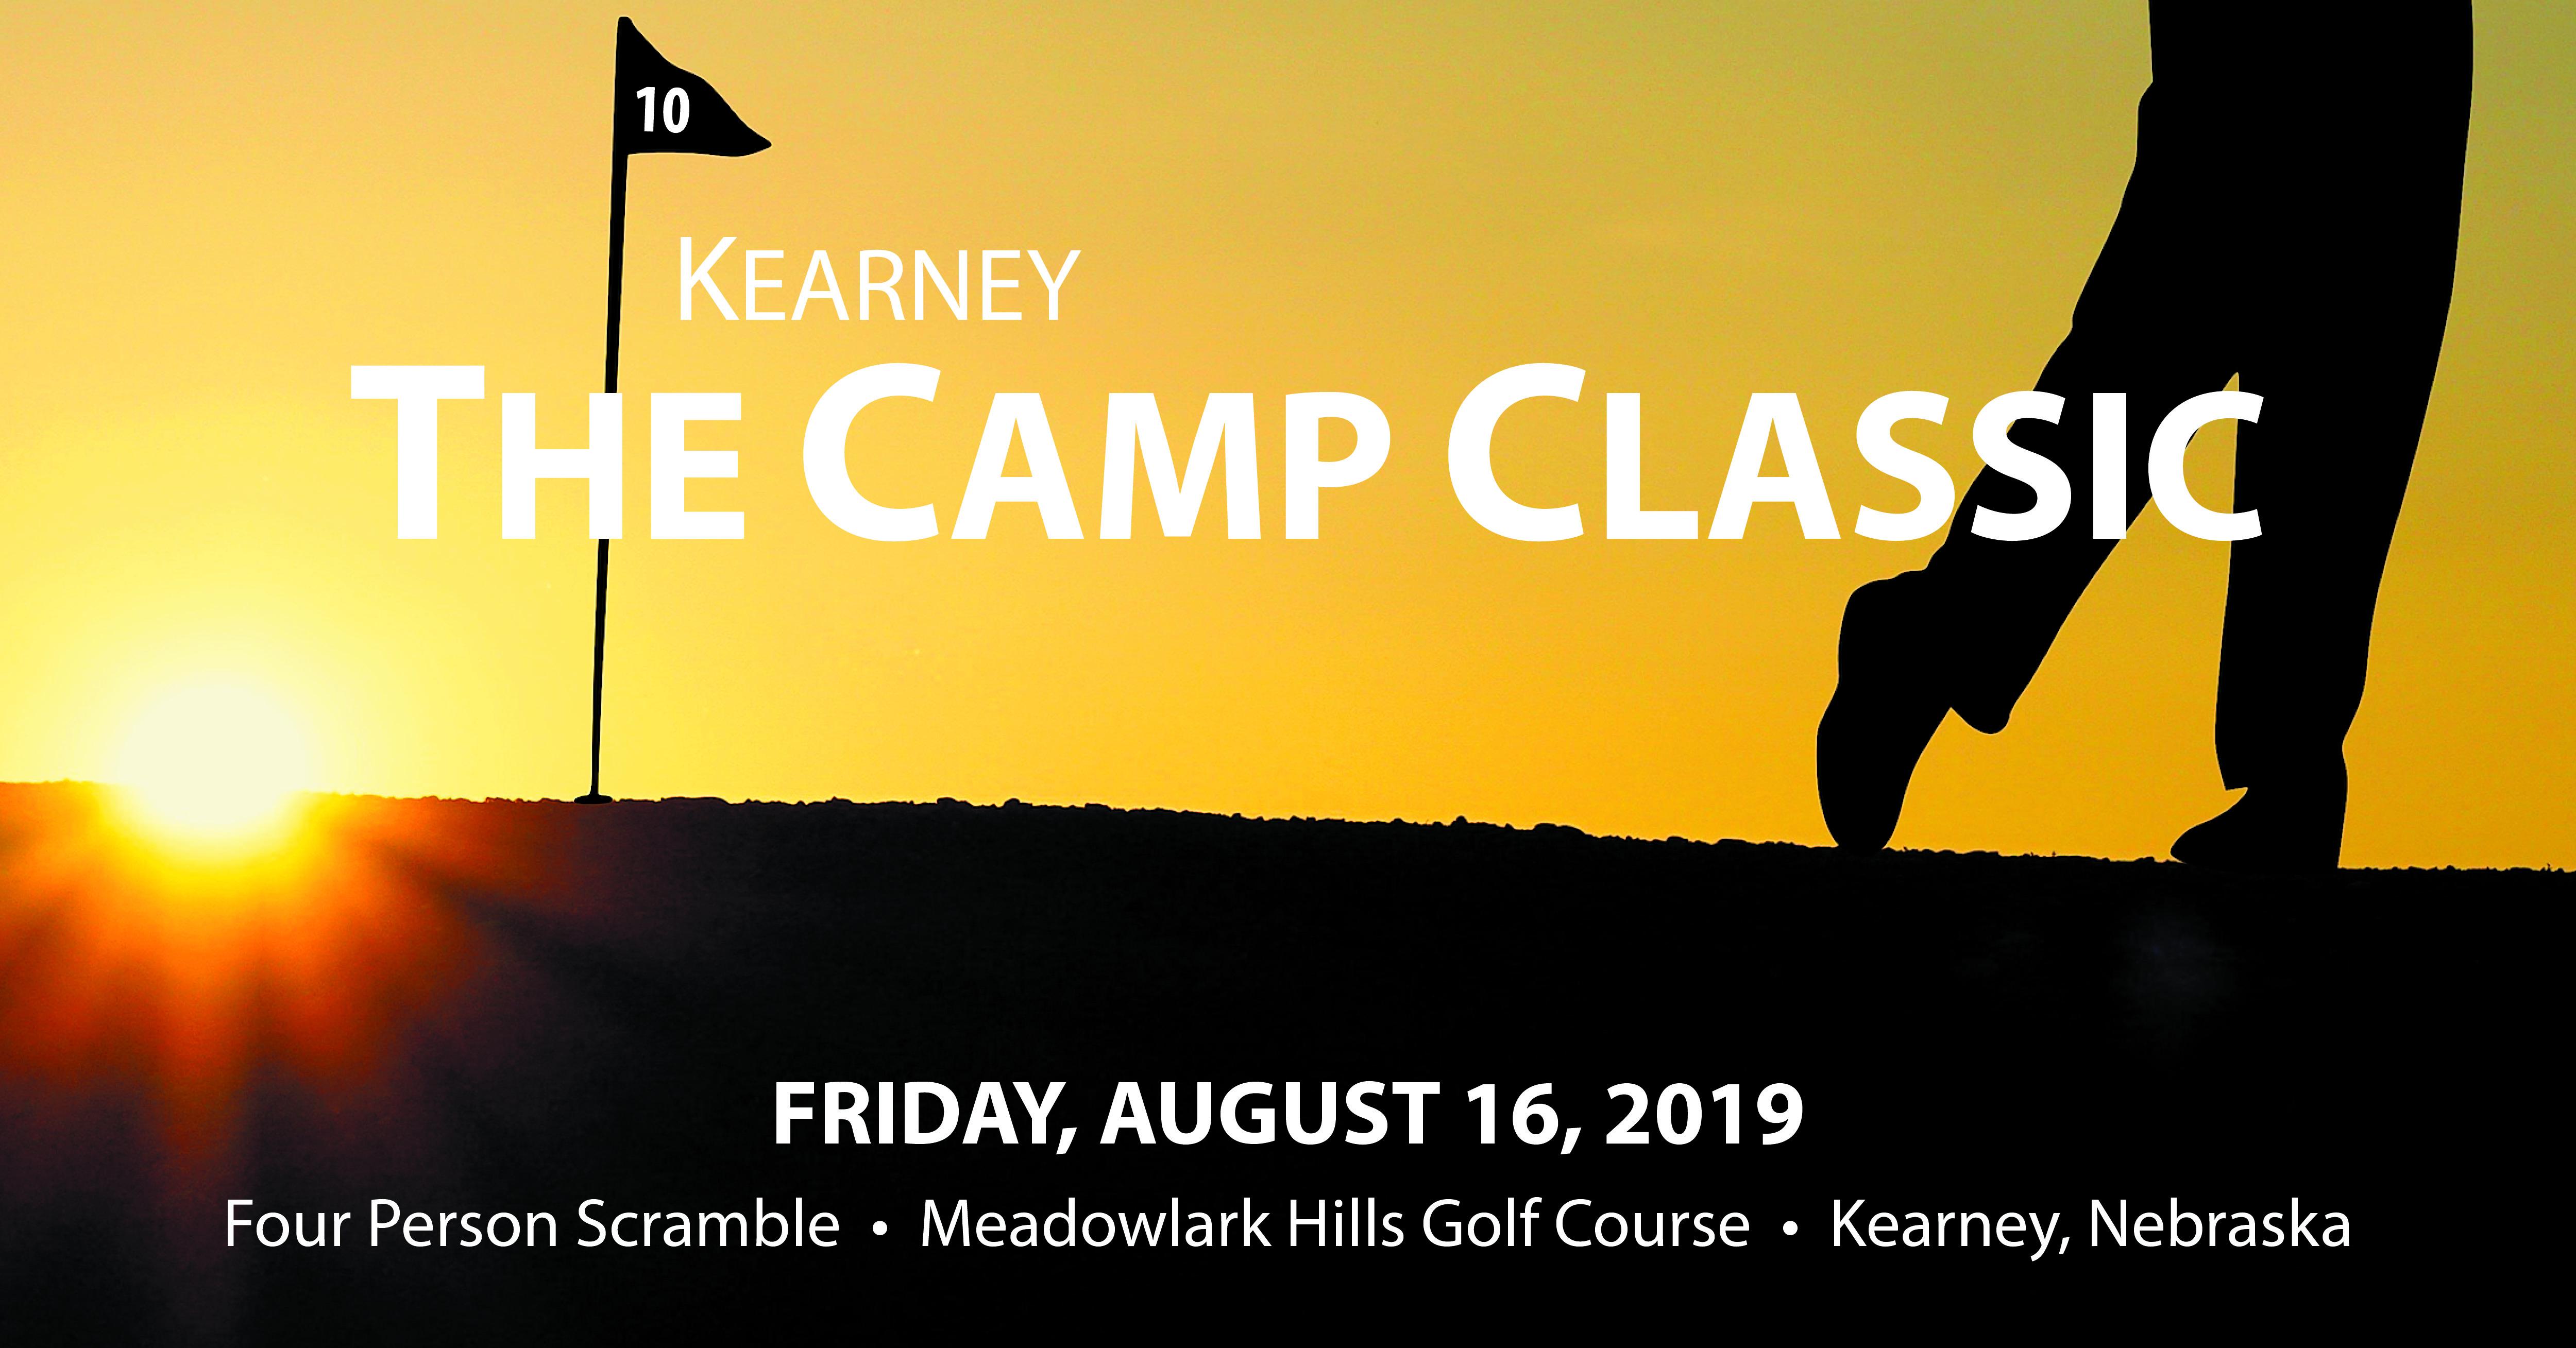 The Camp Classic Golf Tournament – Kearney